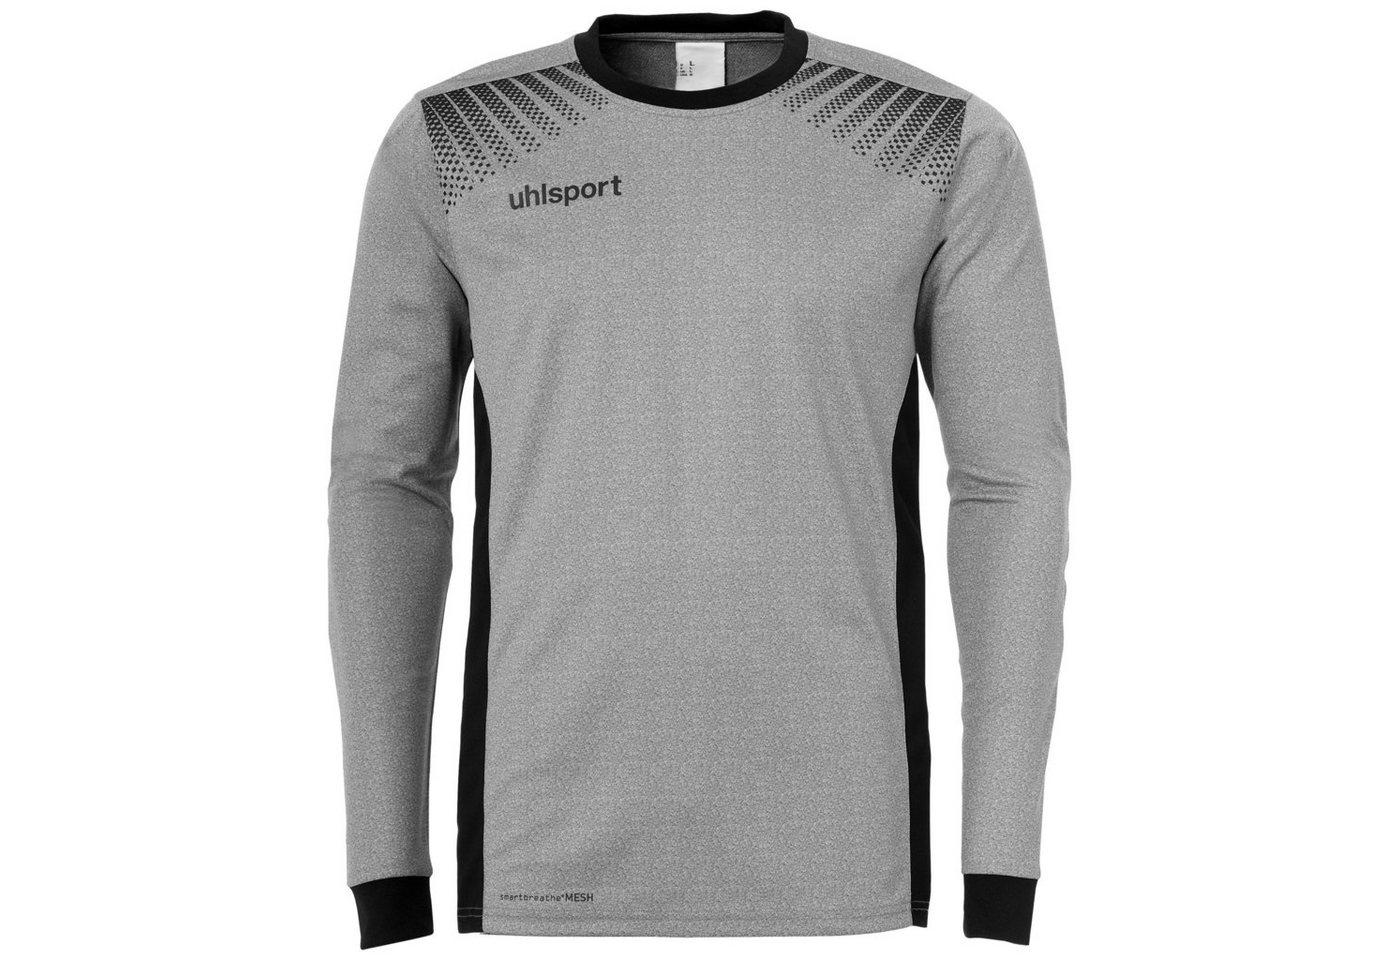 Uhlsport Goal Torwartshirt Langarm Herren | Sportbekleidung > Sportshirts > T-Shirts | Grau | Polyester | Uhlsport